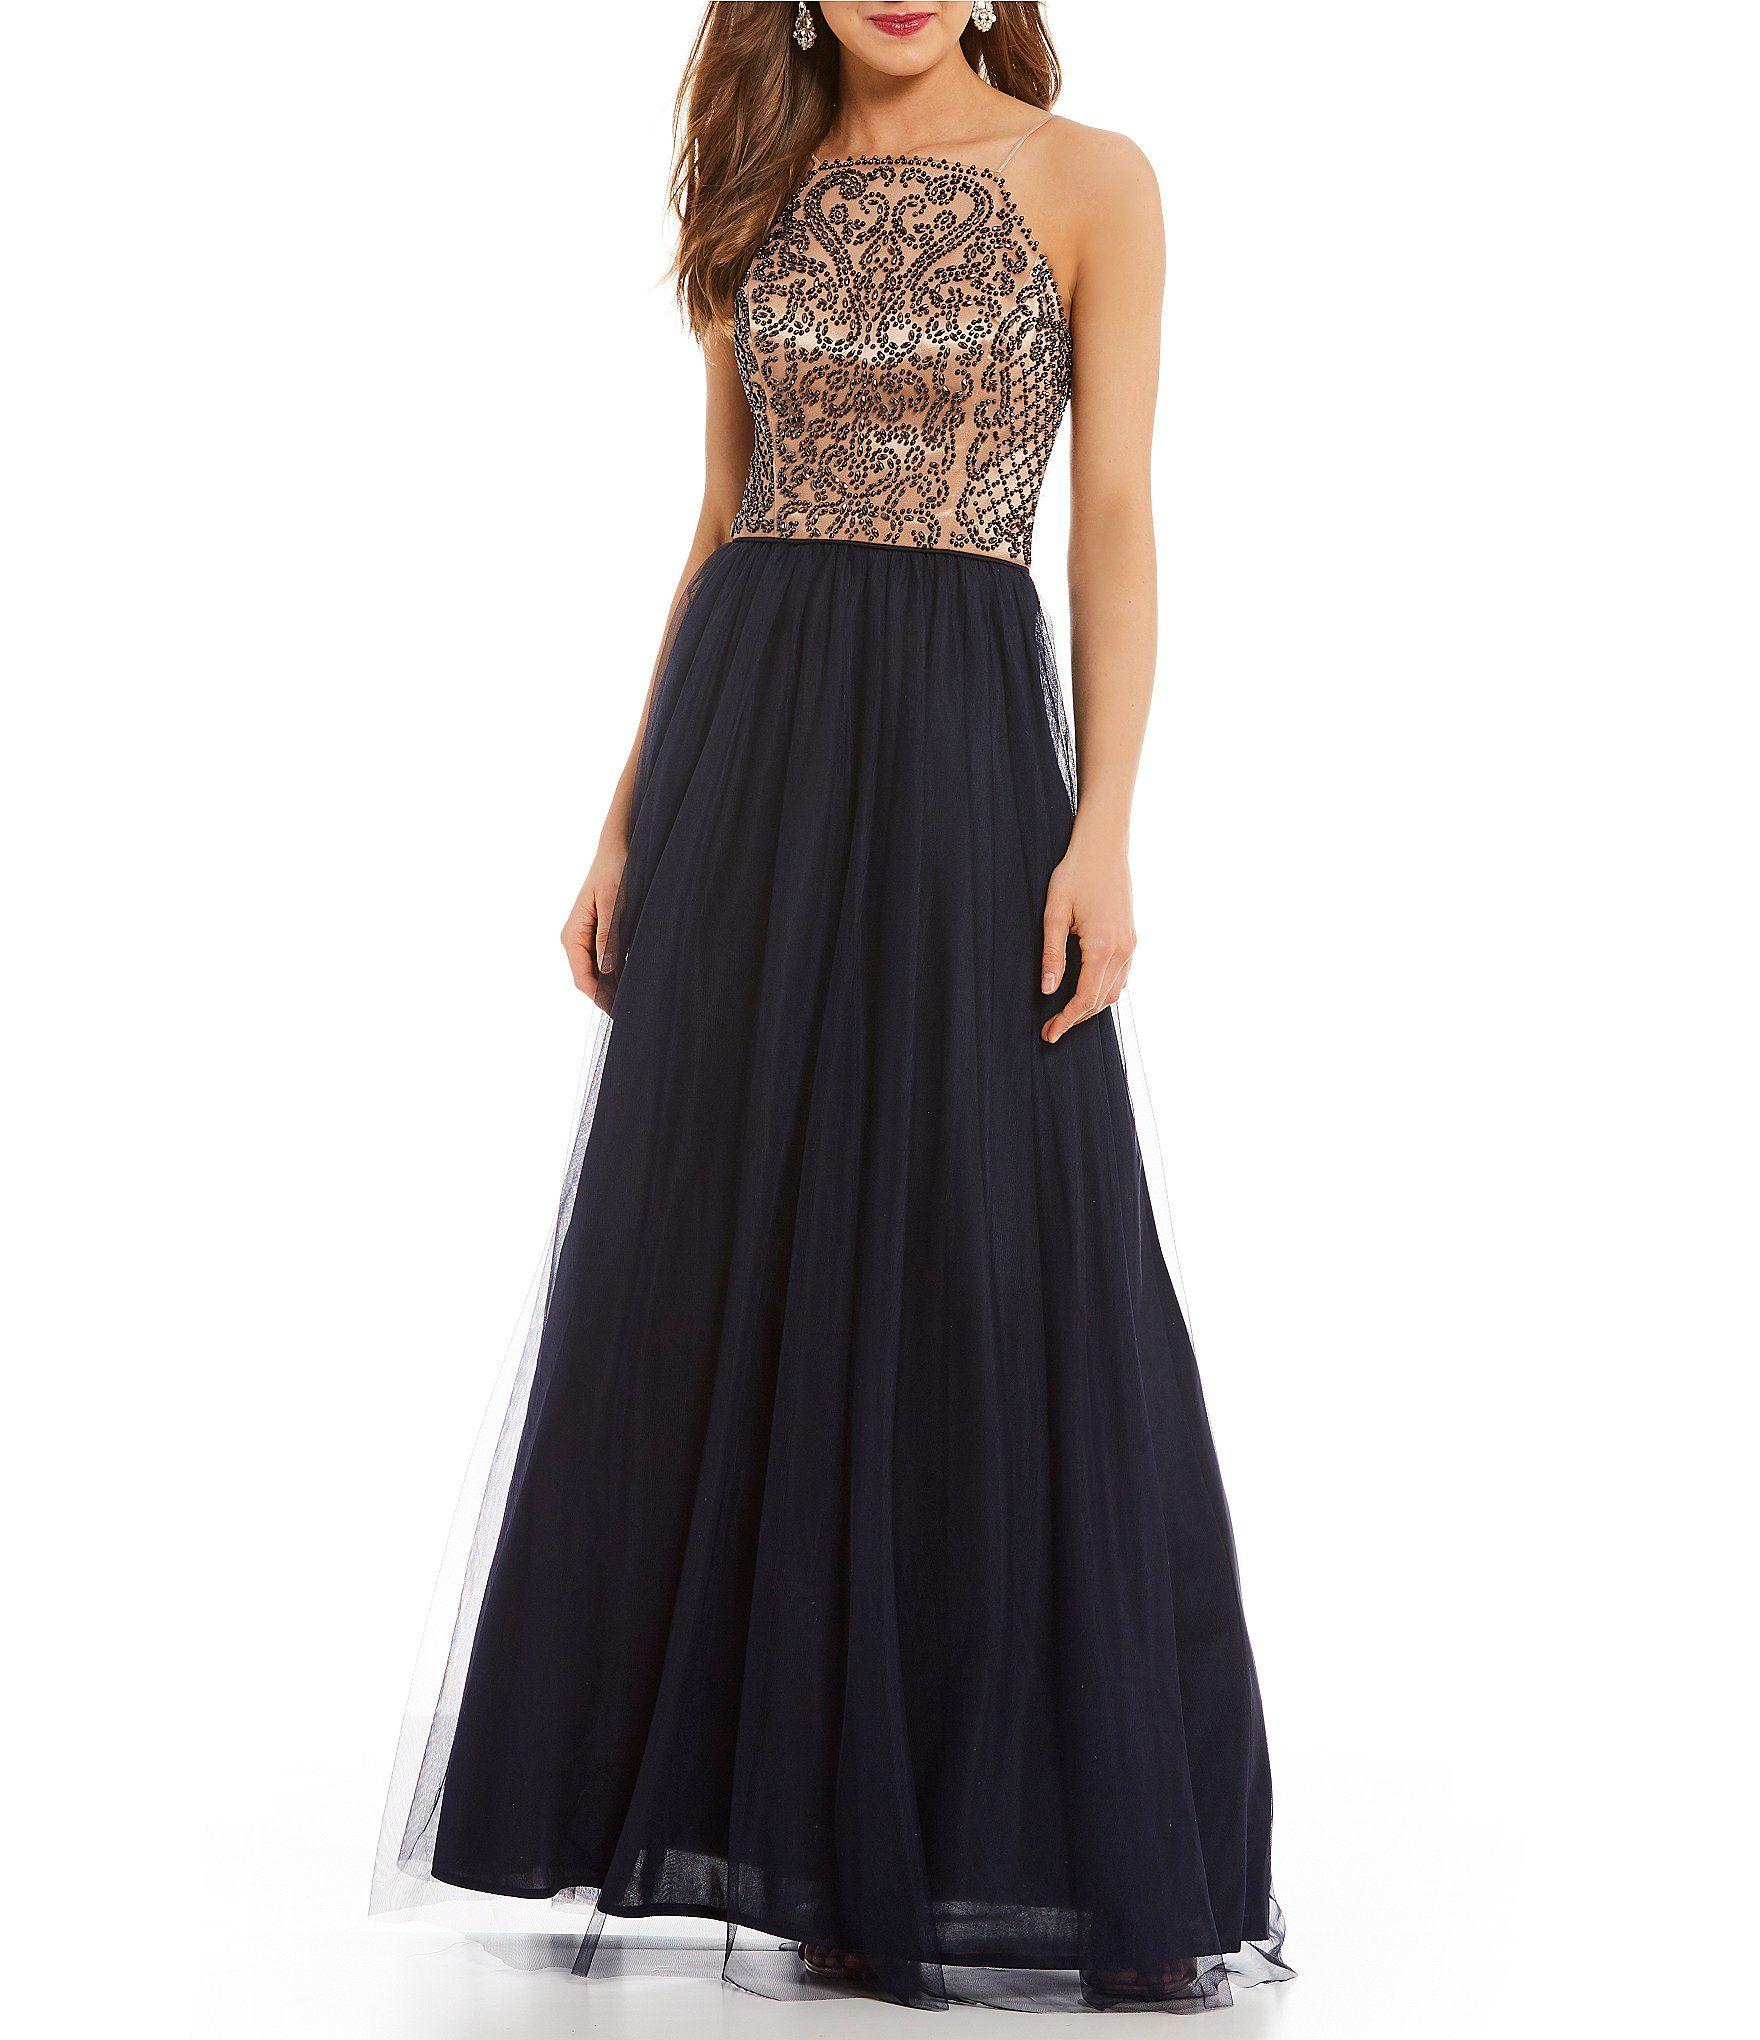 f47da825bfc Blondie Nites Beaded Bodice Ball Gown  Dillards